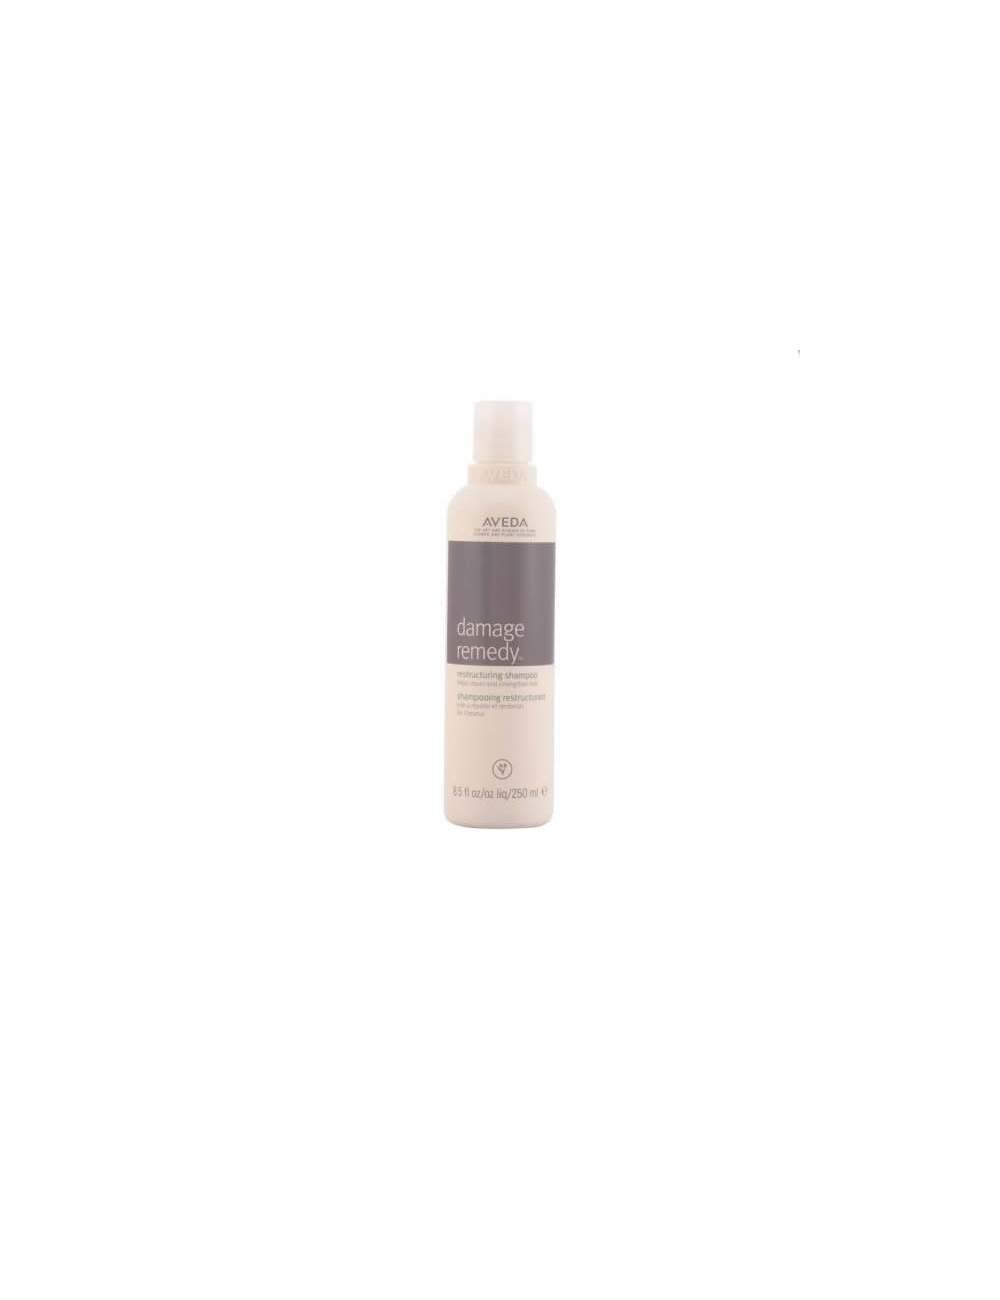 Aveda Damage Remedy Restructuring Shampoo 250ml Nuevo